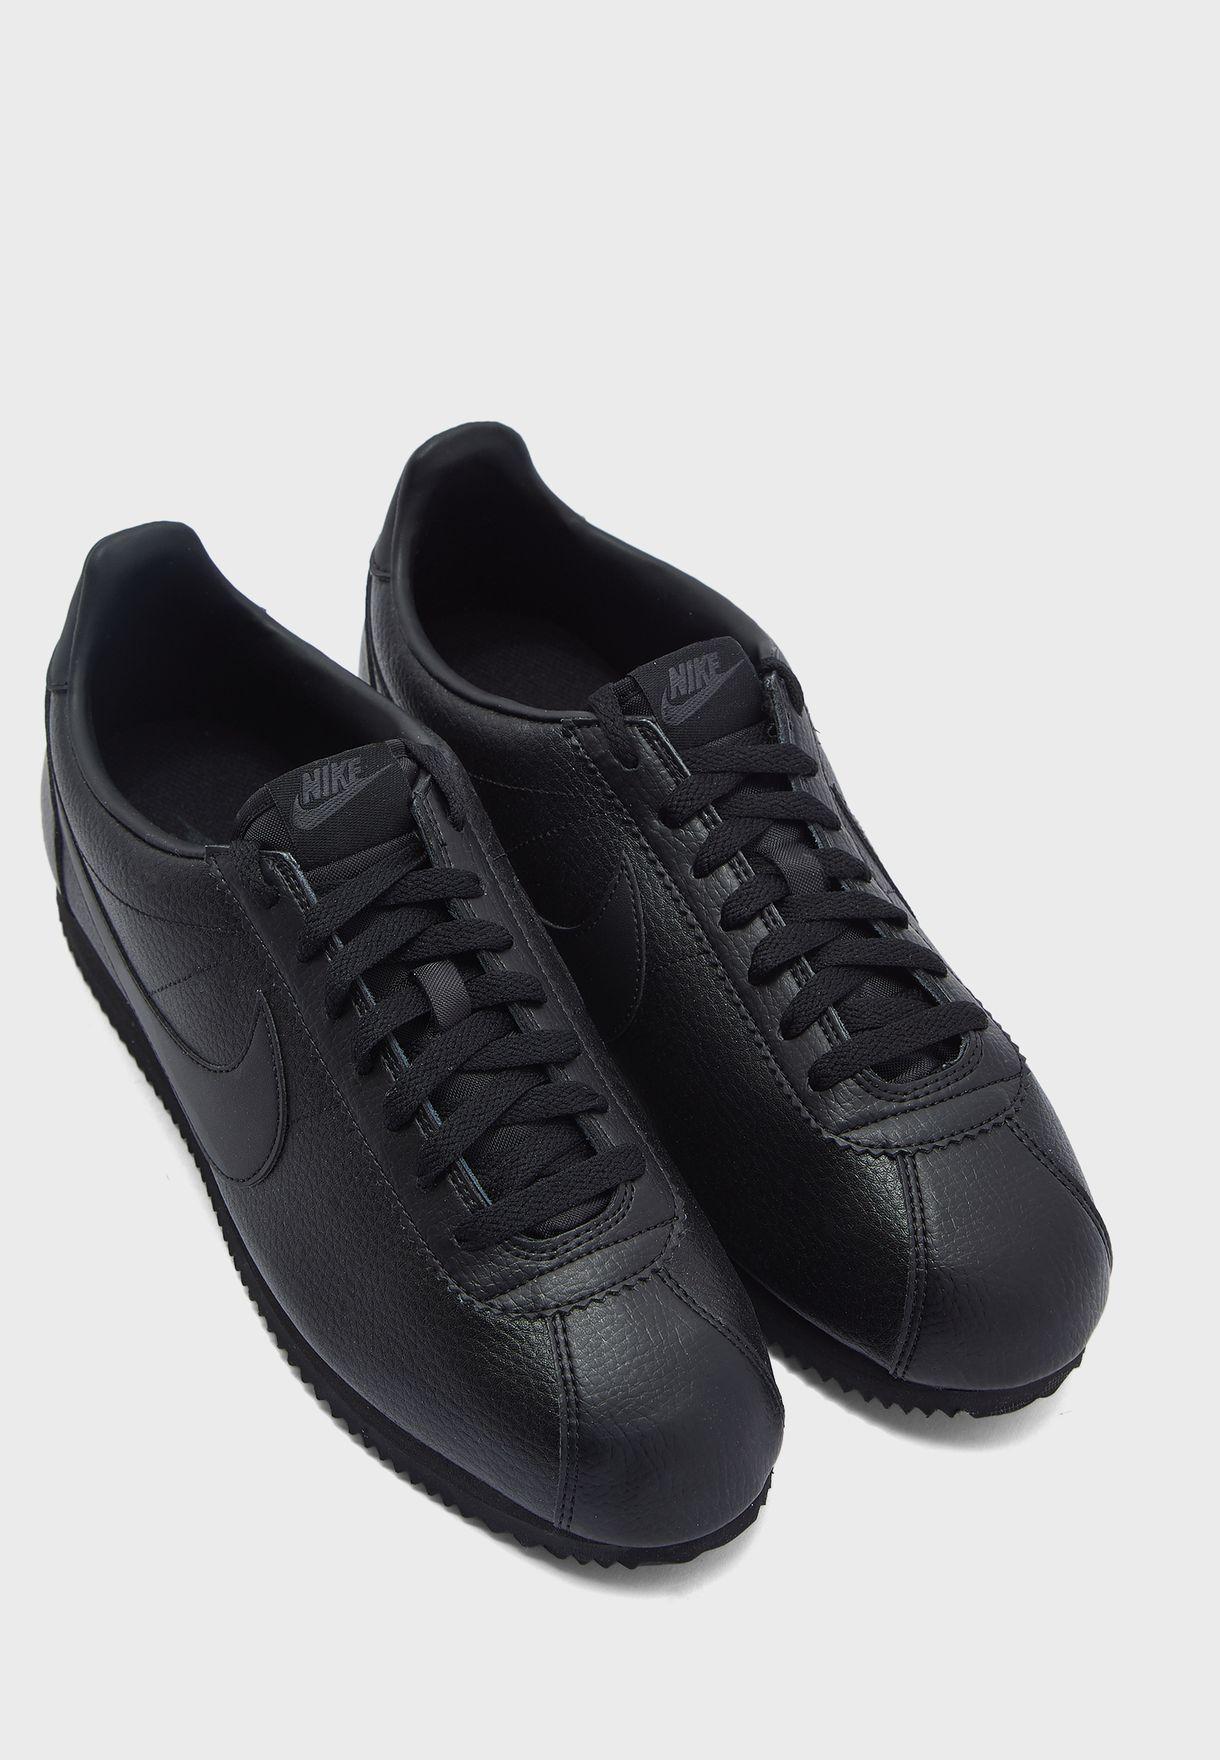 Classic Cortez Leather